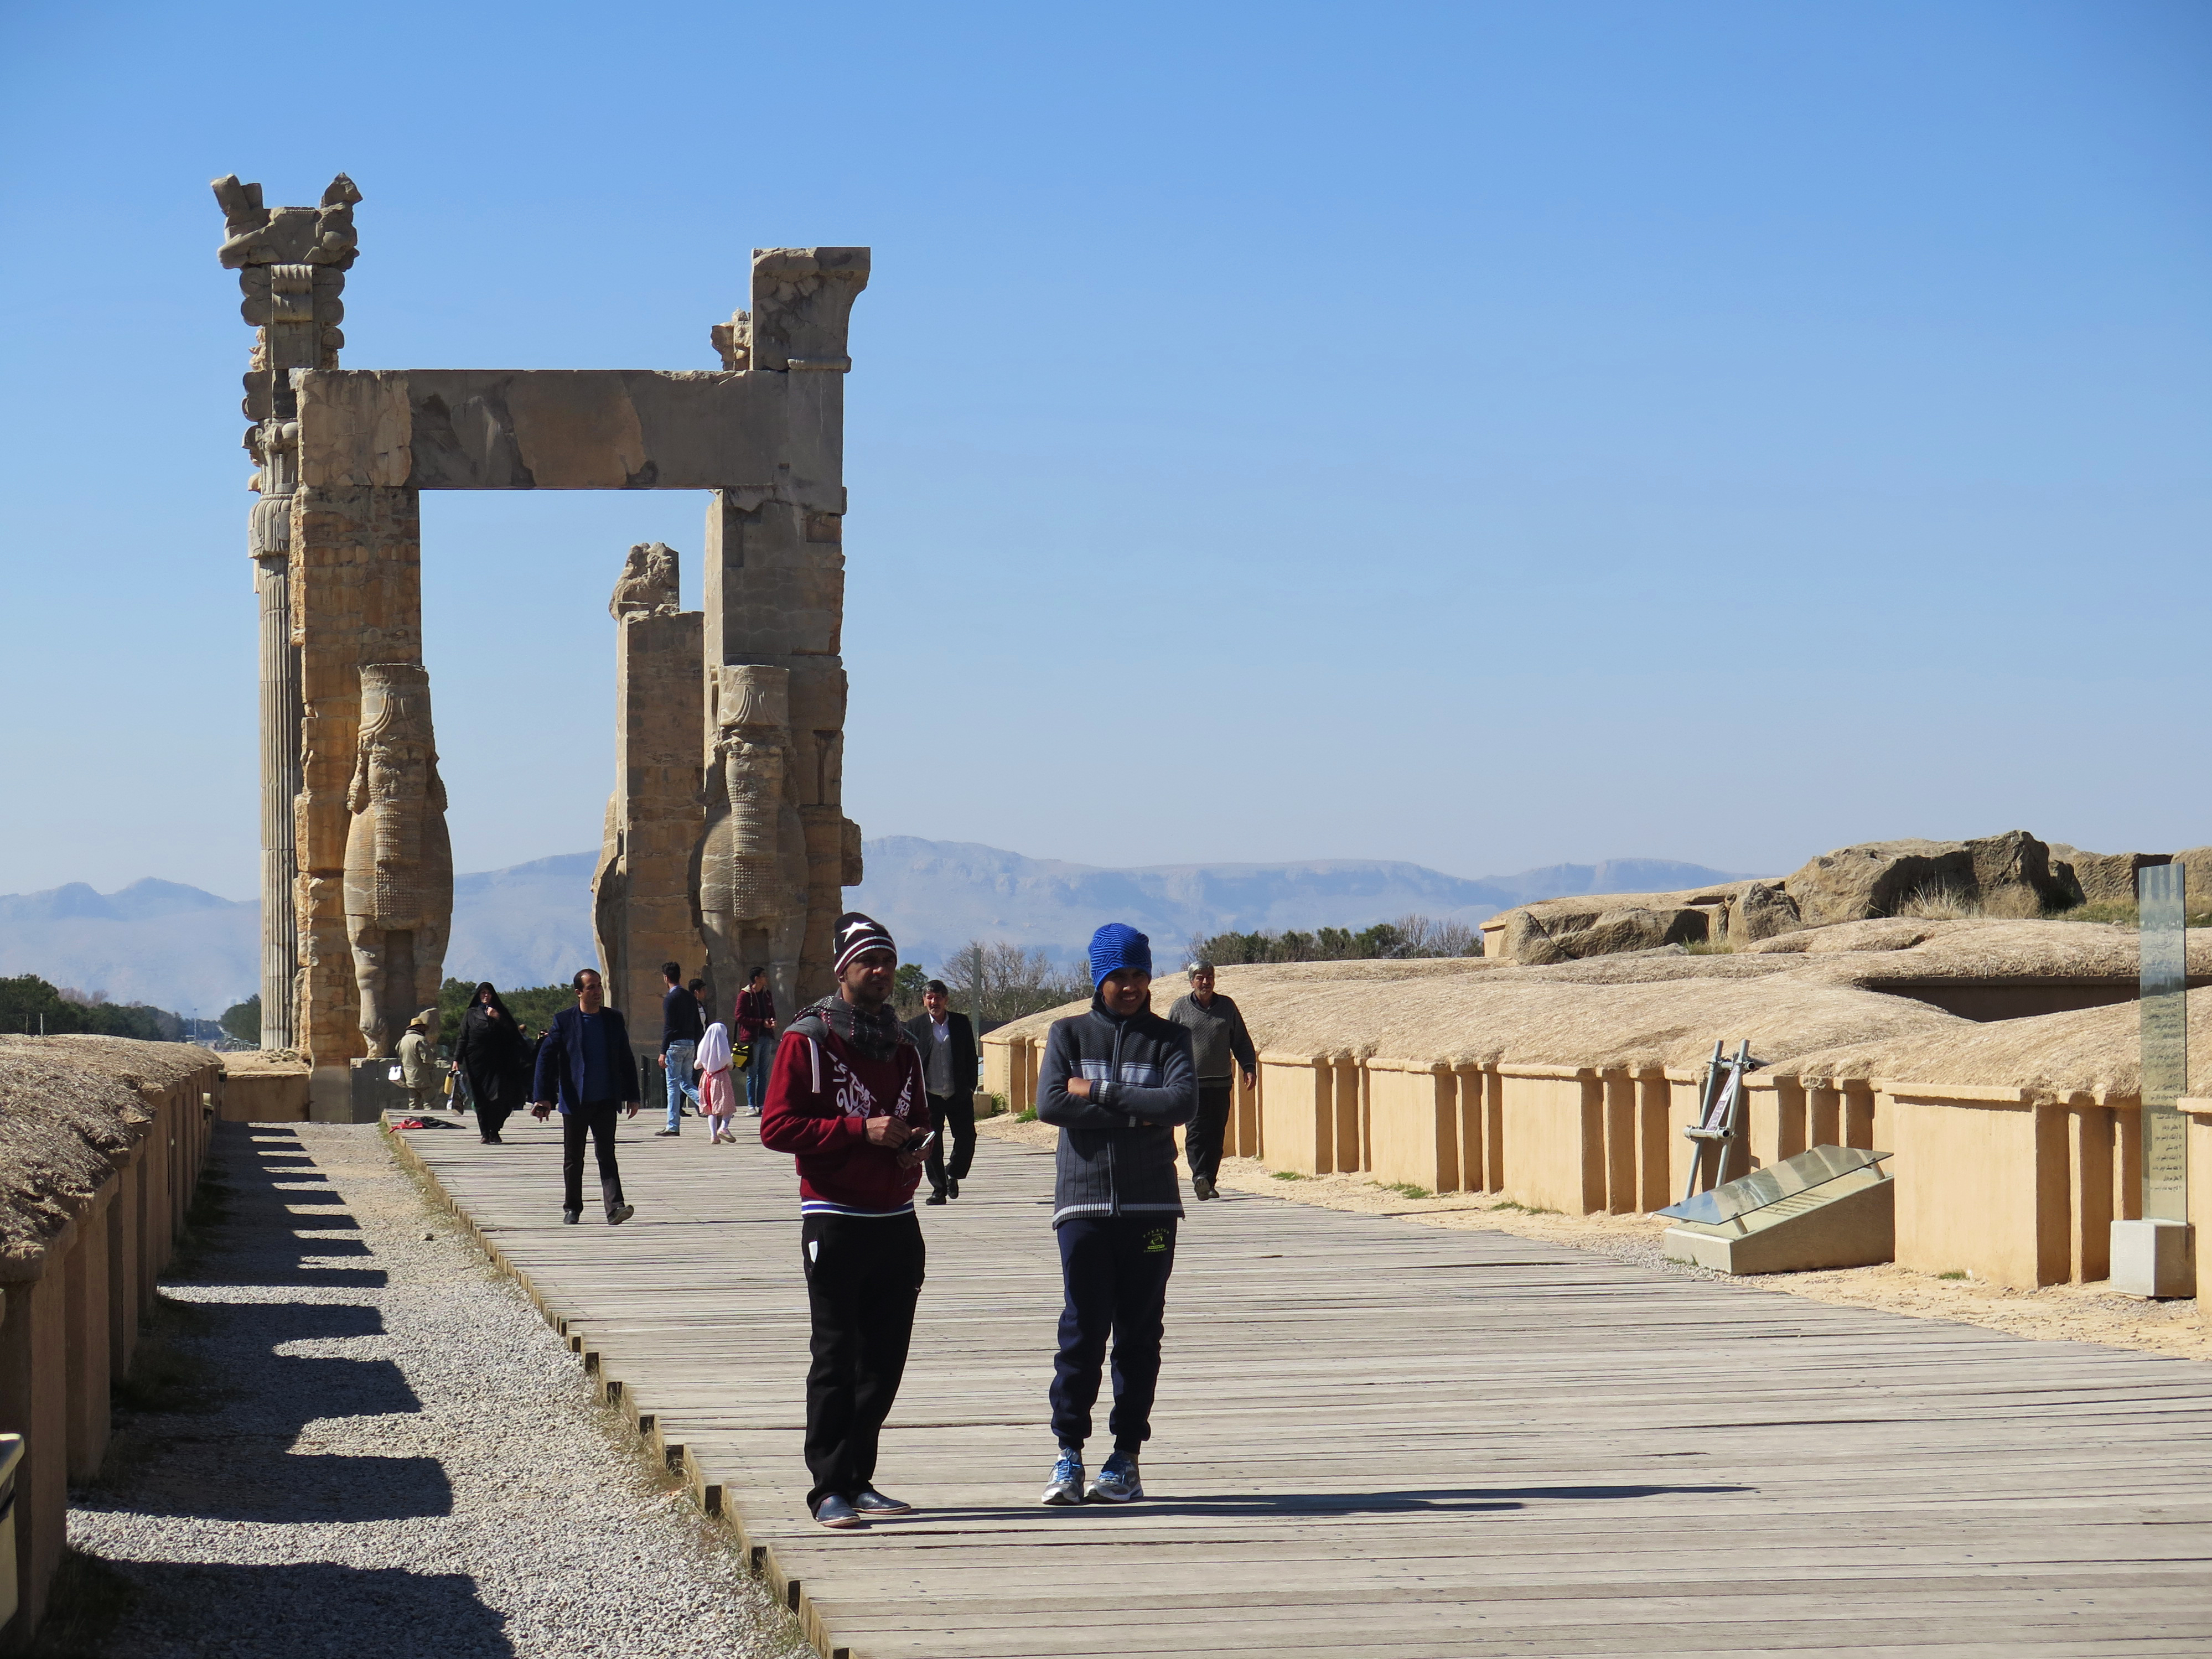 At Persepolis Iran S Grand Past Overshadows Its Frustrating Present Ncpr News